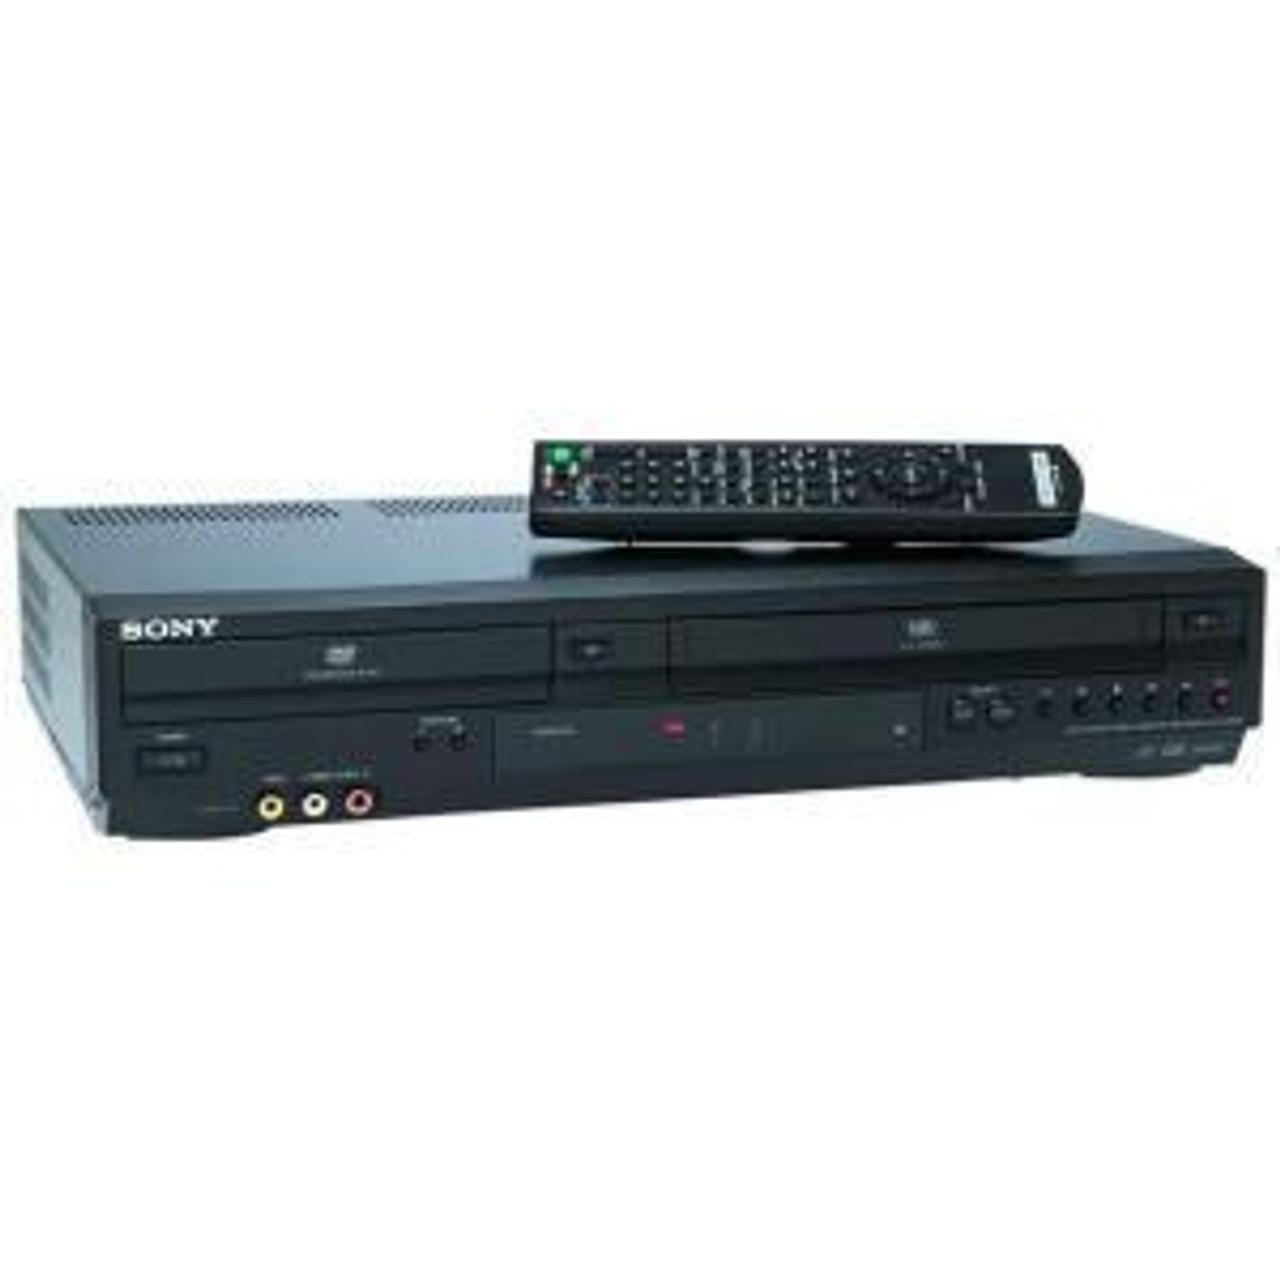 sony slv d380p dvd vcr combo rh porterelectronics com Sony DVD Recorder VCR Combo Sony DVD VCR Combo Player